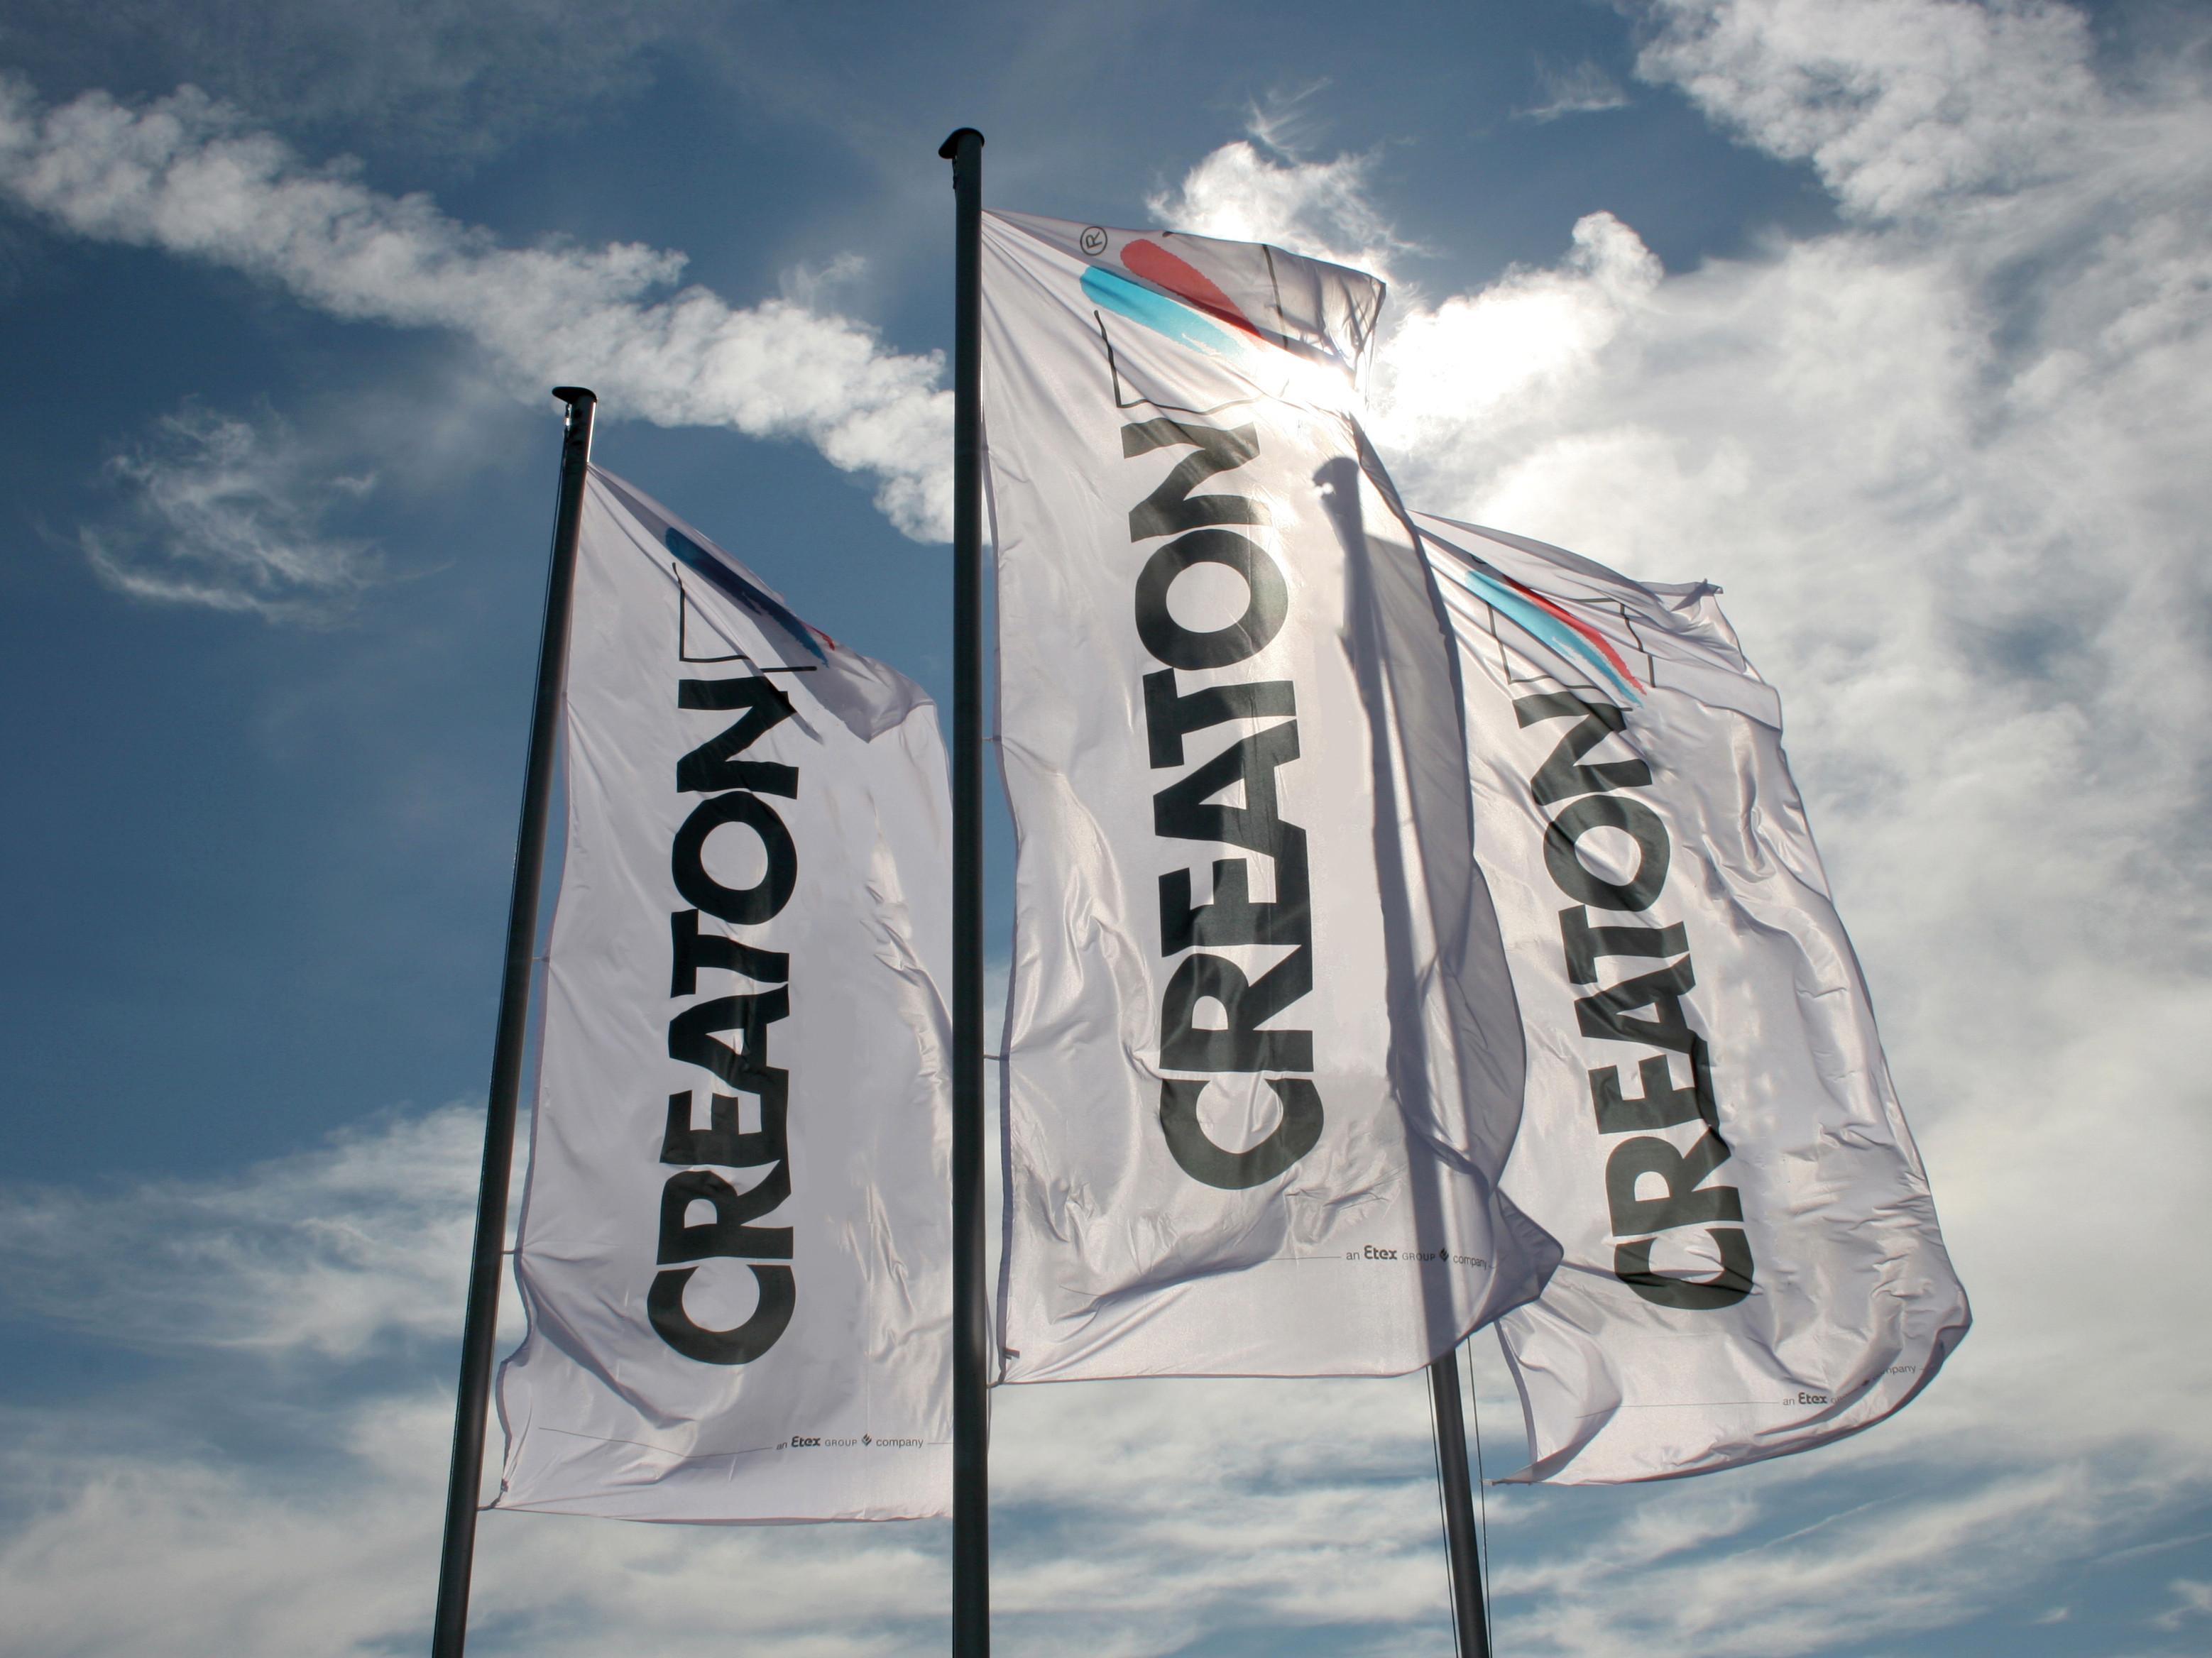 CREATON flags